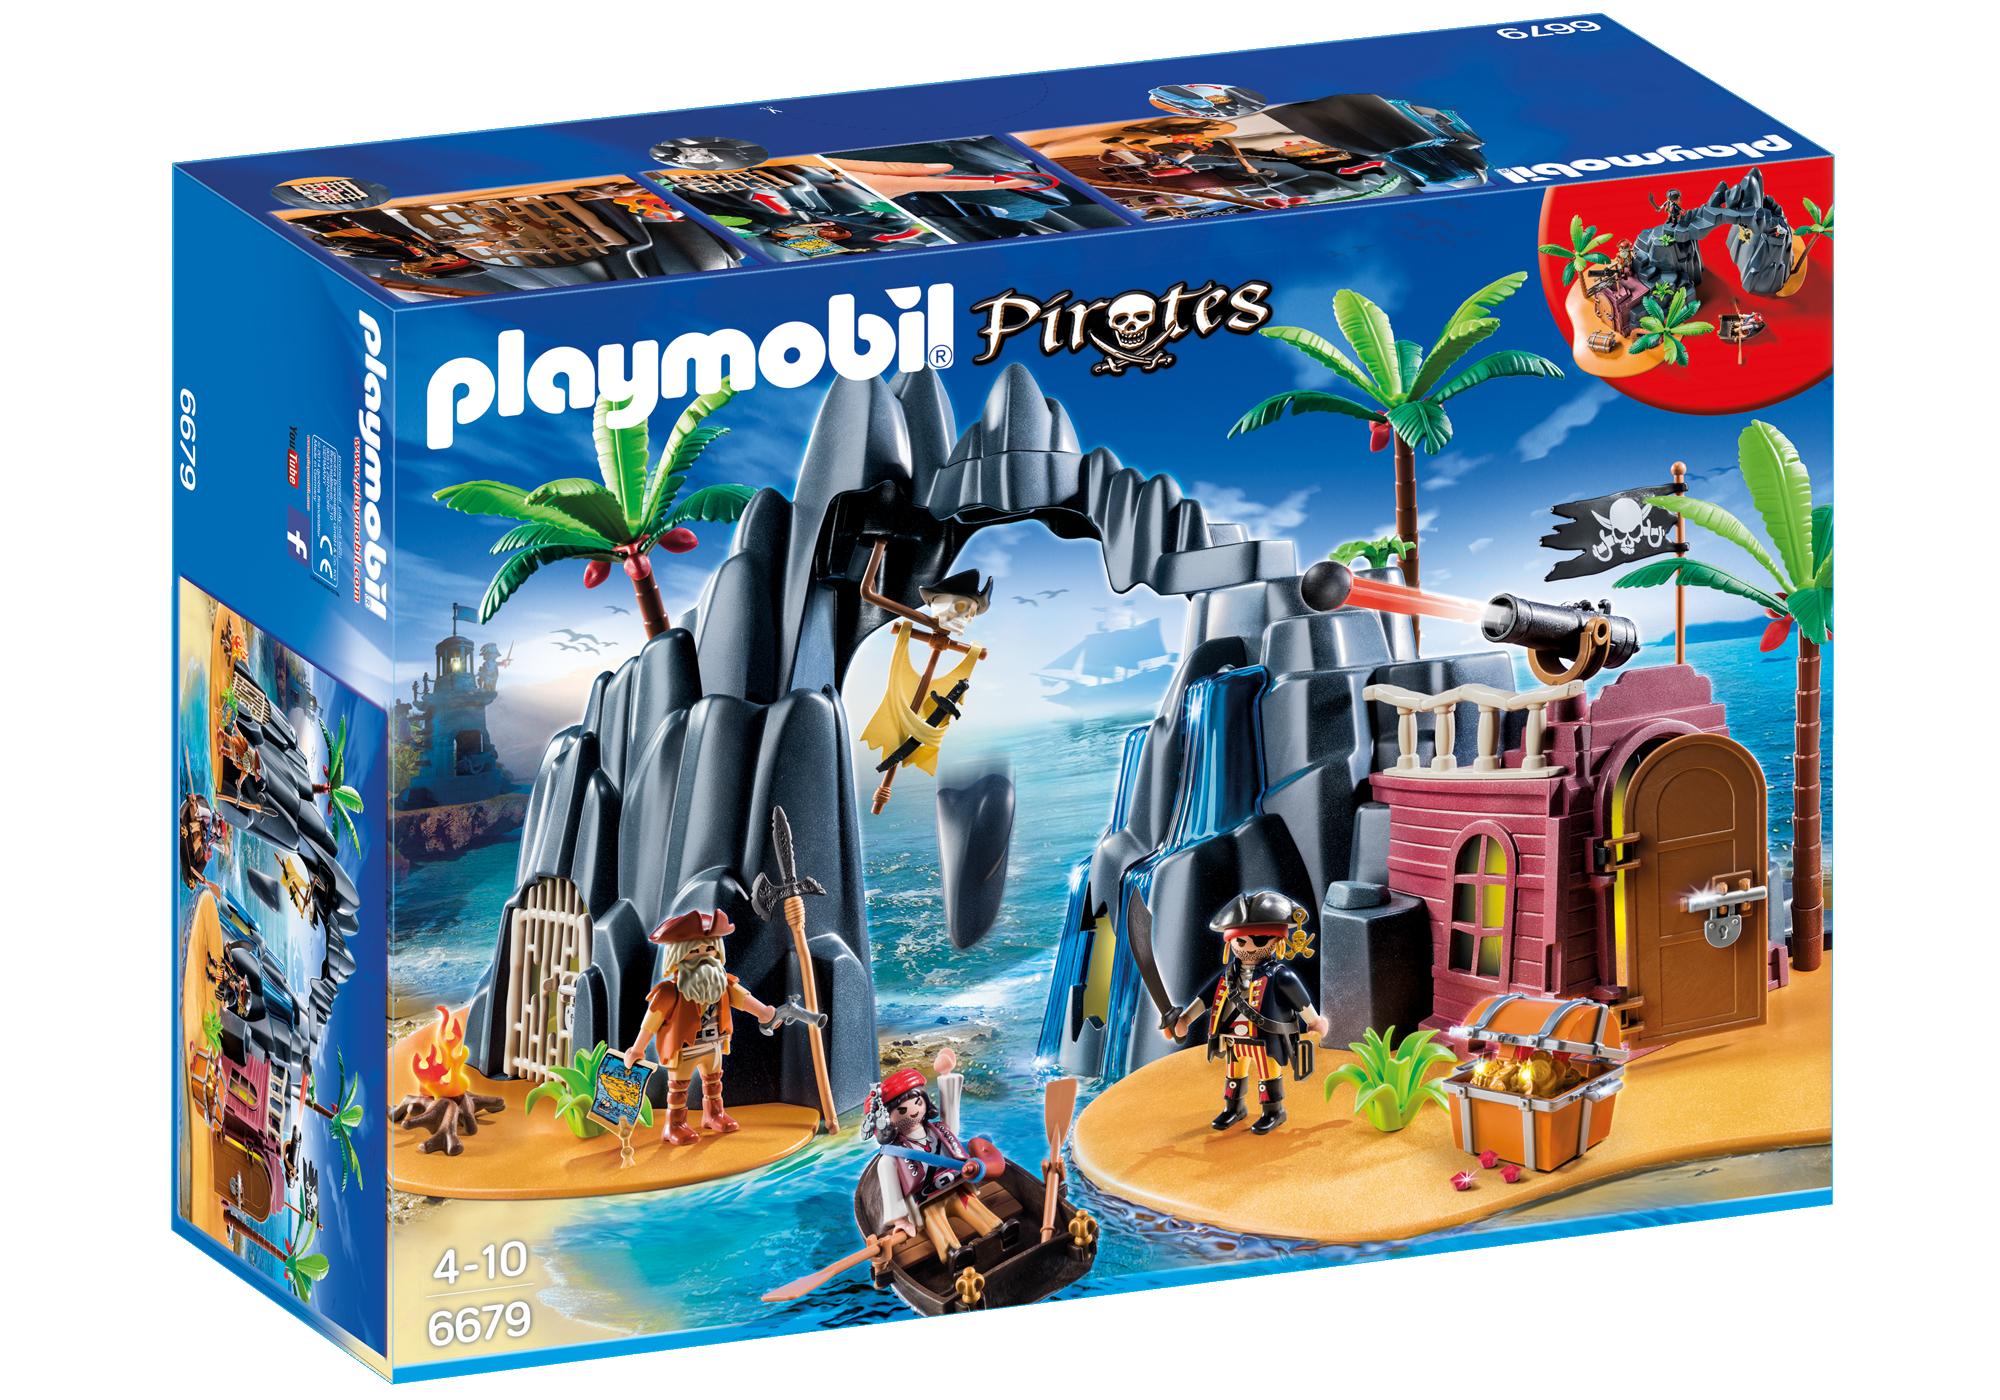 http://media.playmobil.com/i/playmobil/6679_product_box_front/Piraten-Schatzinsel